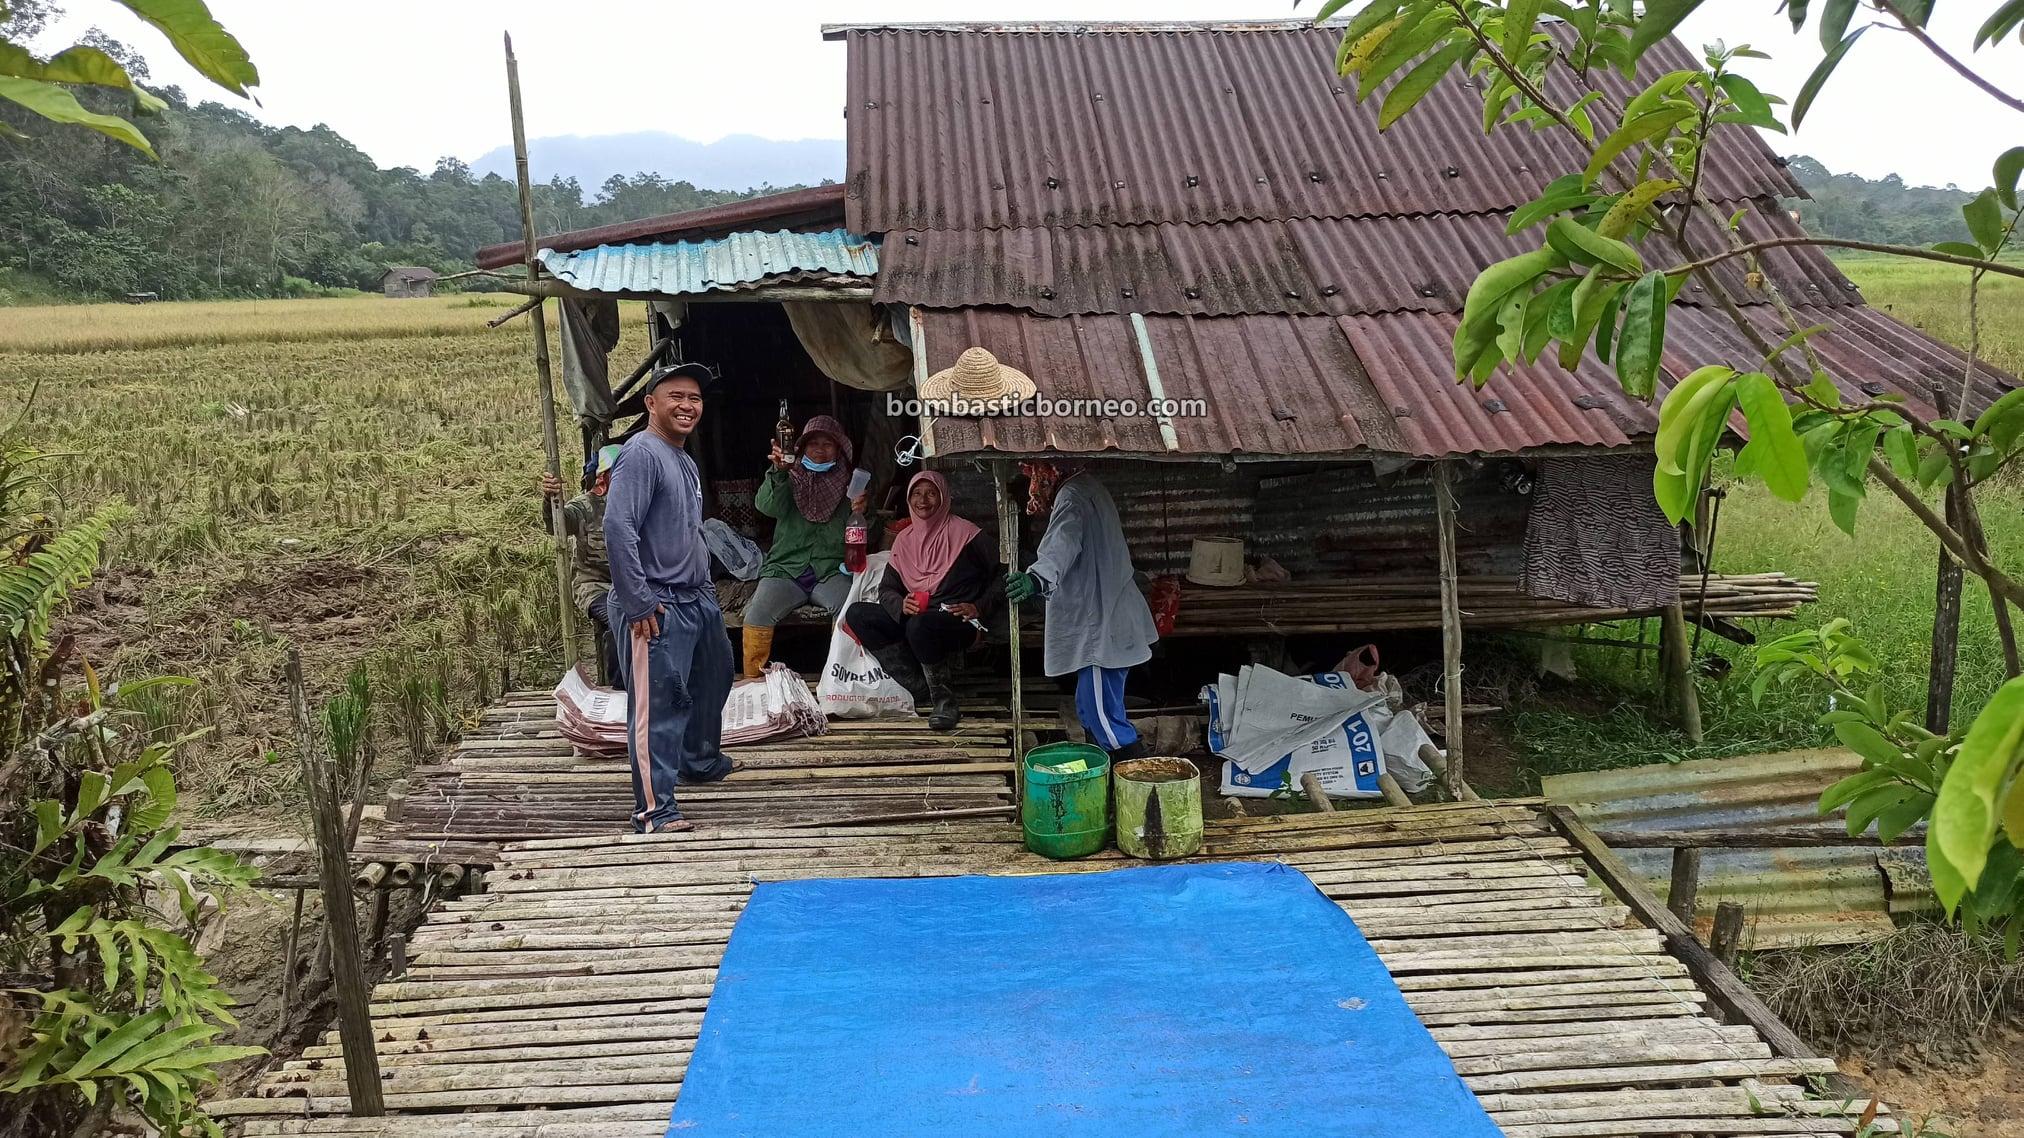 Kampung, Paddy Field, Paddy Farming, Sawah Padi, Penuaian Padi, dayak bidayuh, Destination, Malaysia, Tourism, tourist attraction, Borneo, 穿越婆罗洲游踪, 马来西亚砂拉越, 比达友稻谷收割